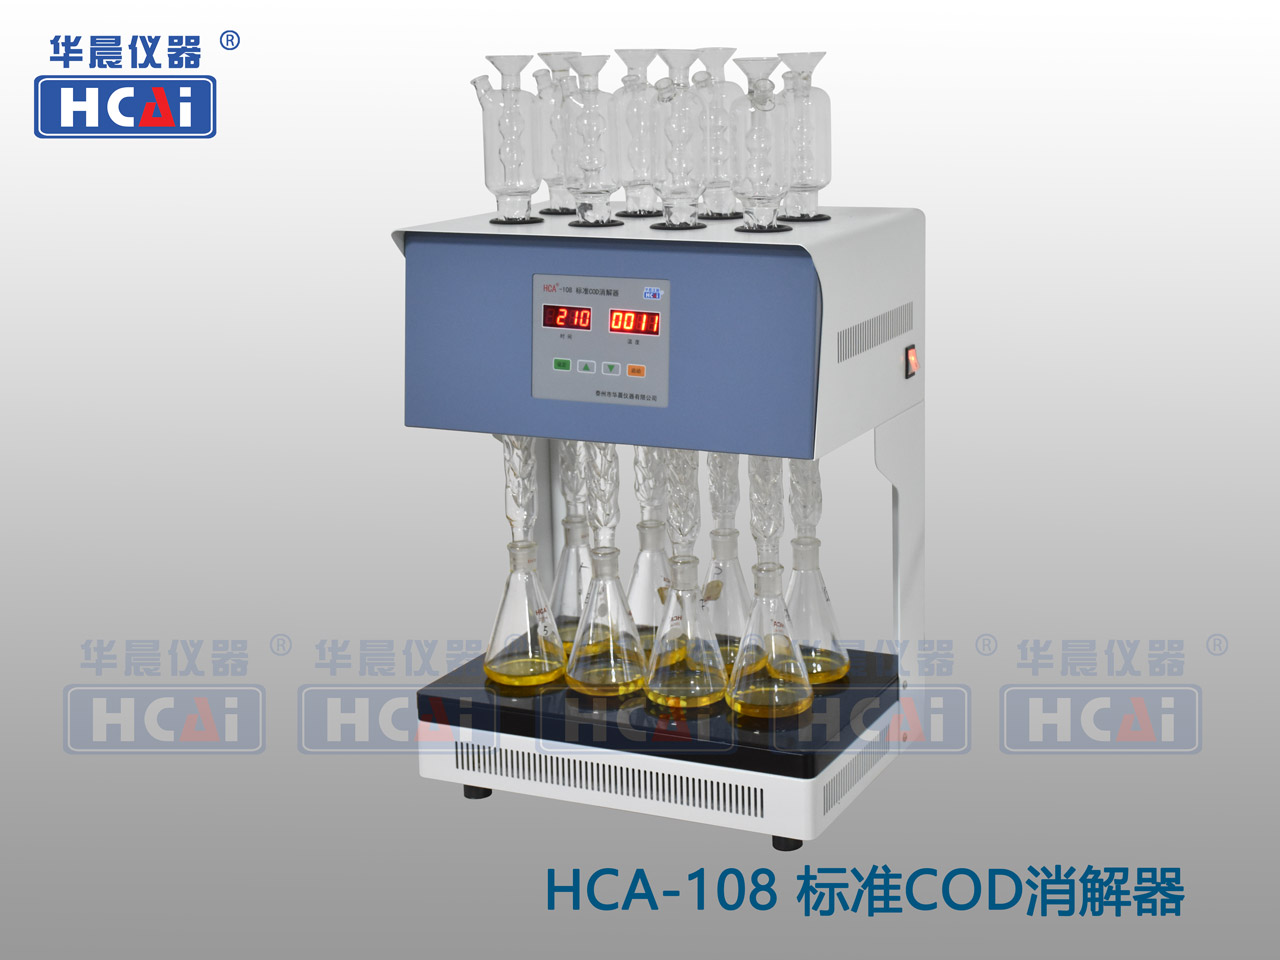 HCA-108标准COD消解器(8管)